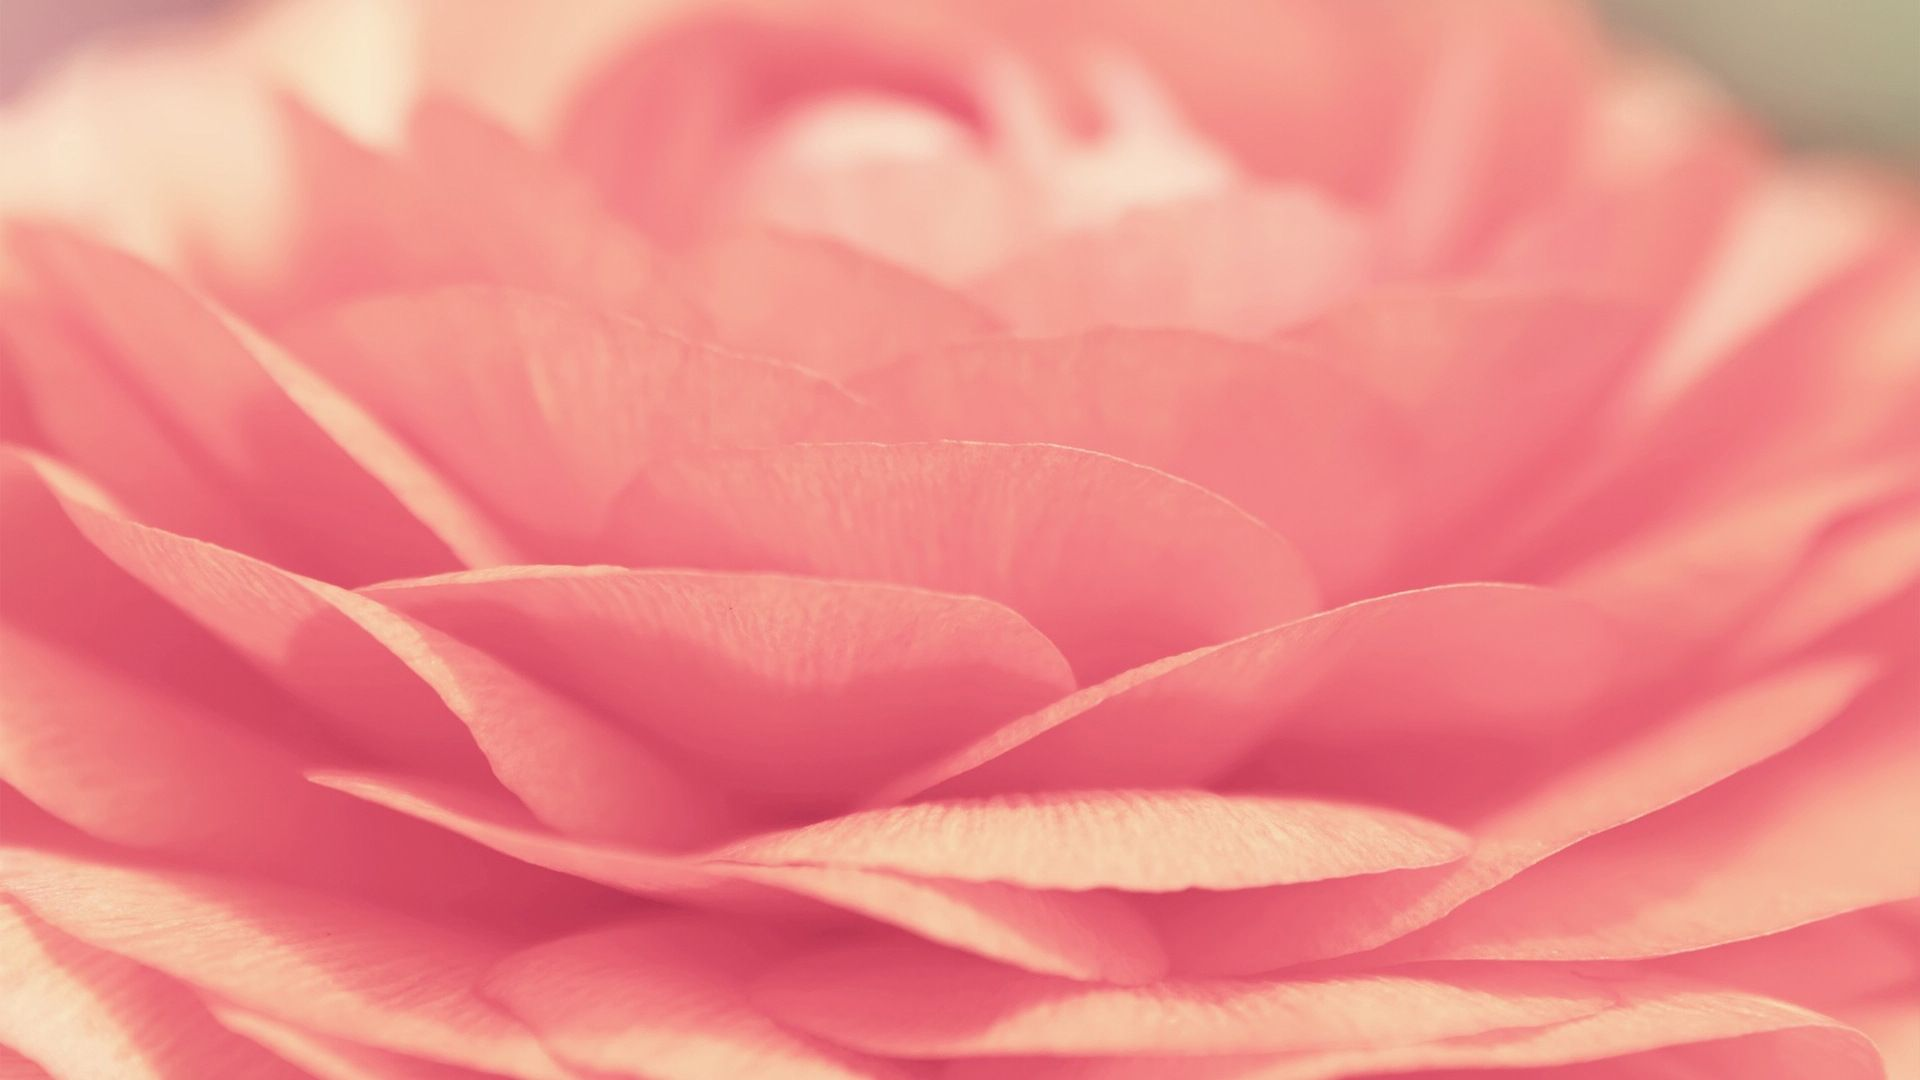 1920x1080 Pink Rose Desktop Pc And Mac Wallpaper Rose Wallpaper Ipad Wallpaper Ipad Air Wallpaper